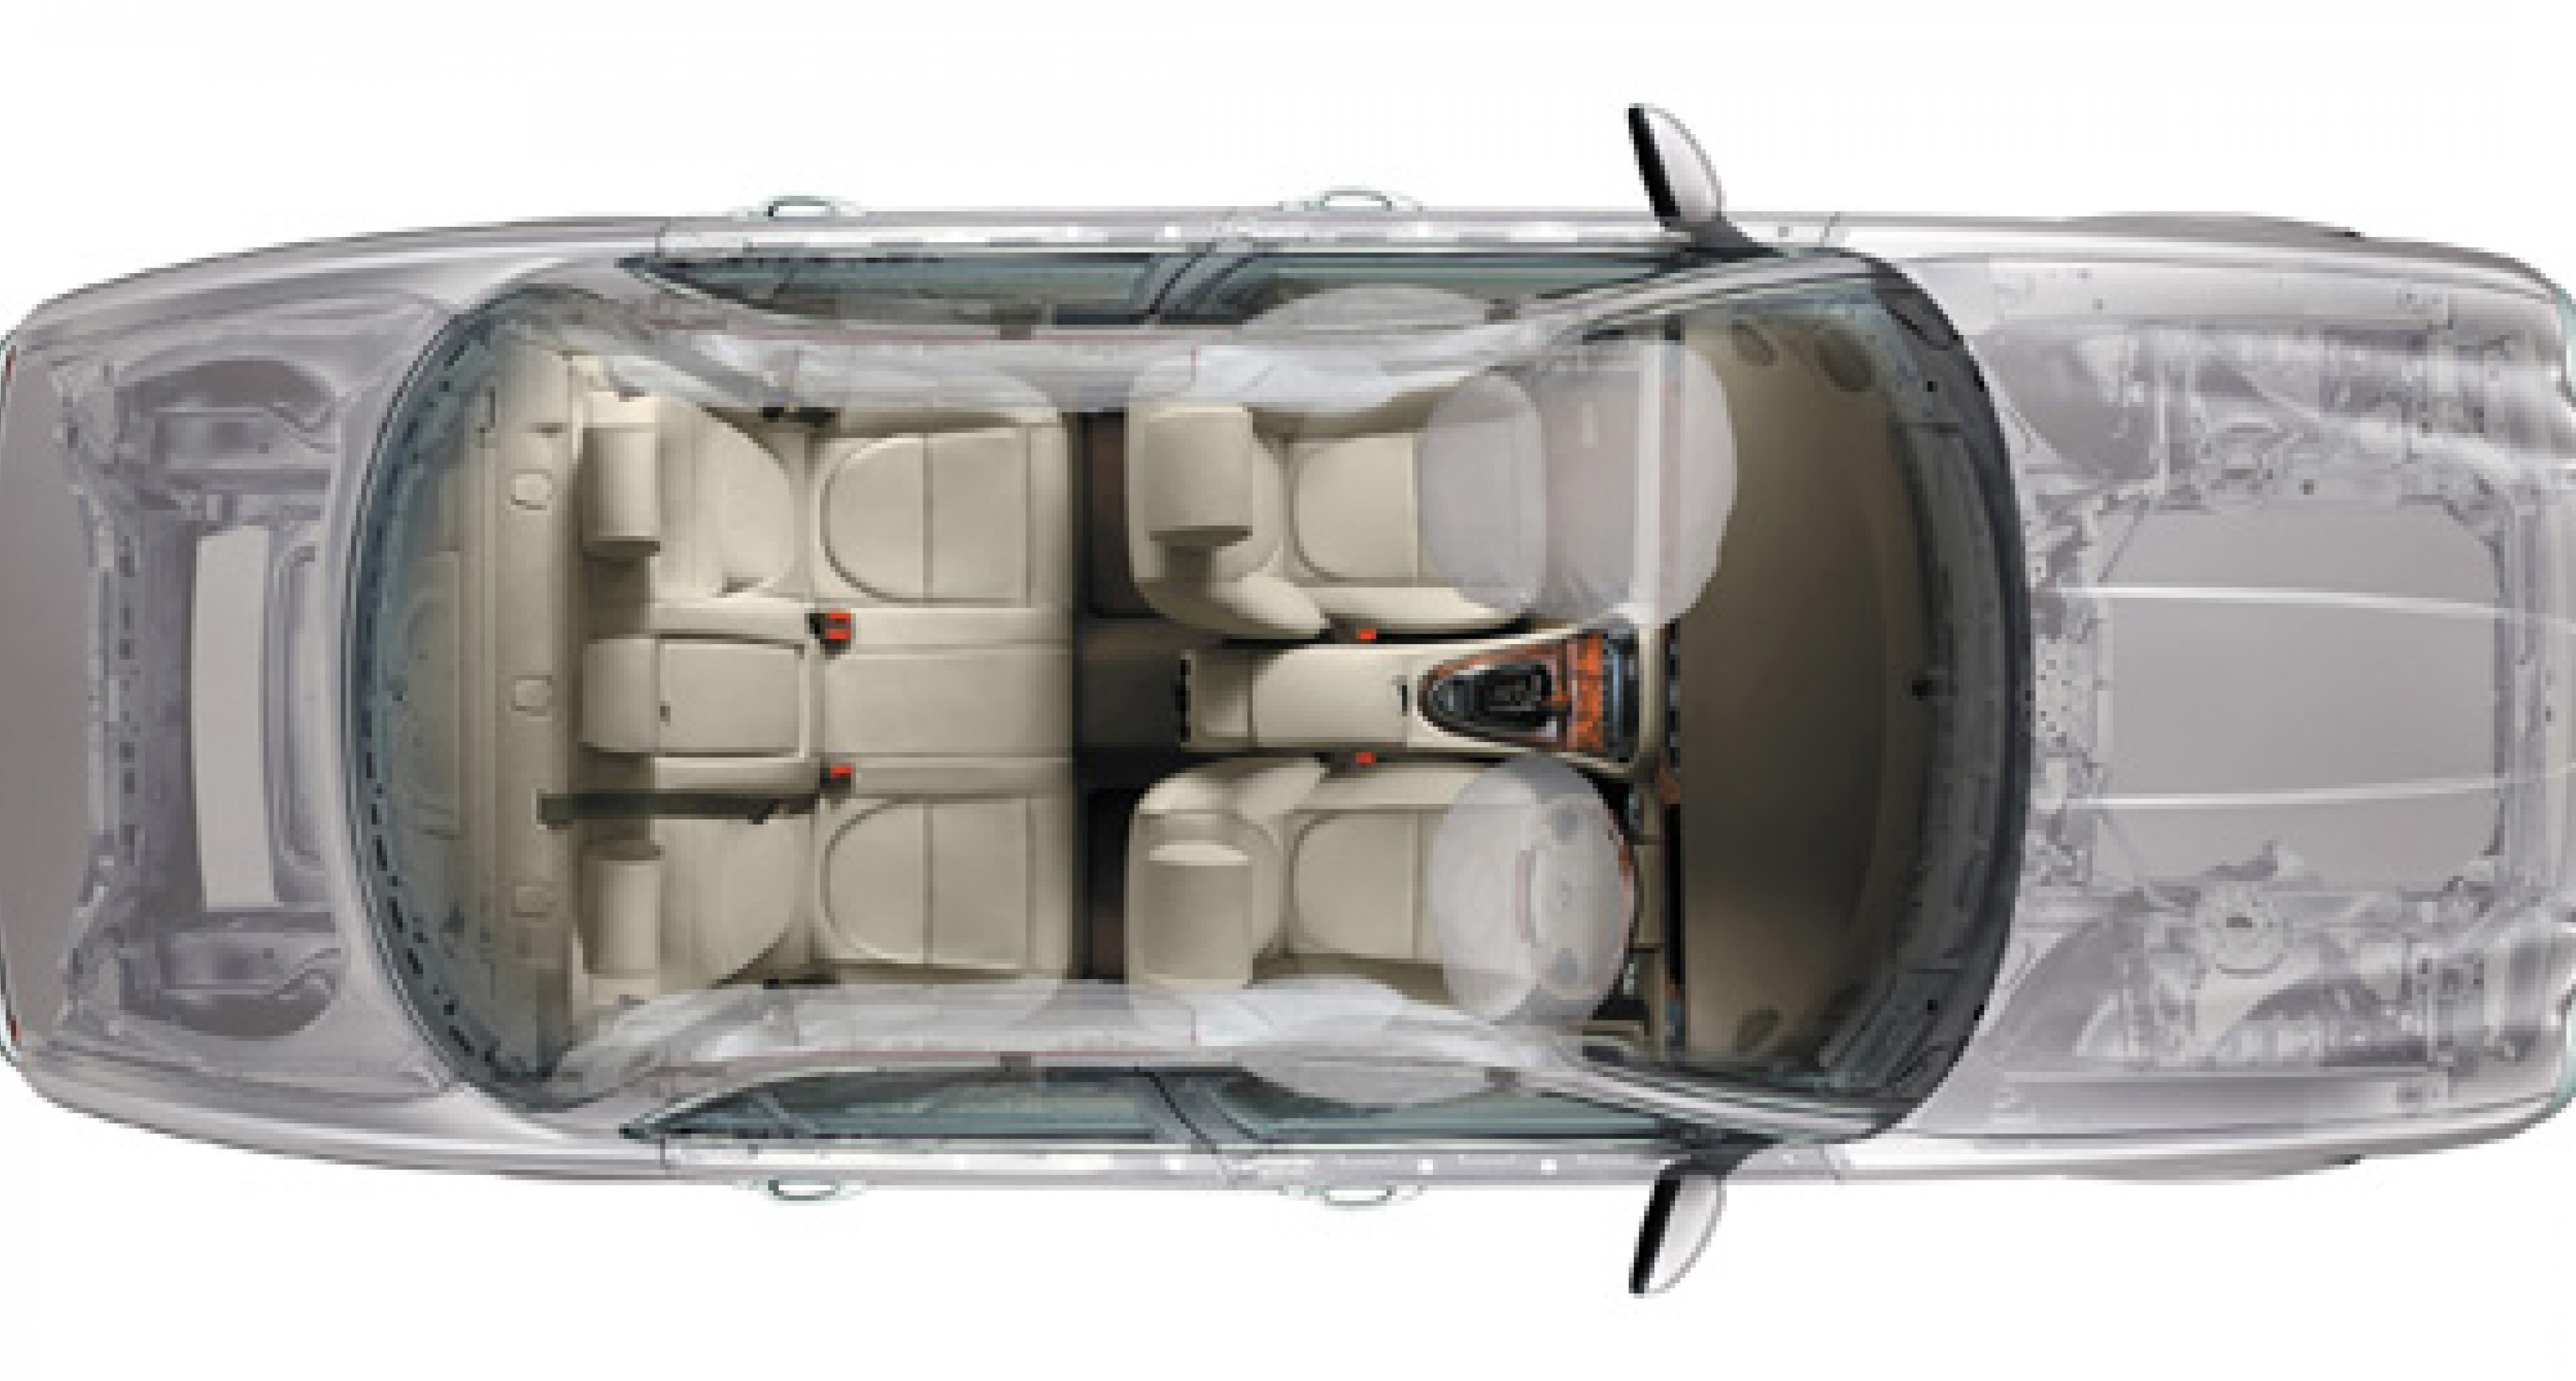 Jaguar announces UK pricing of new XJ saloon